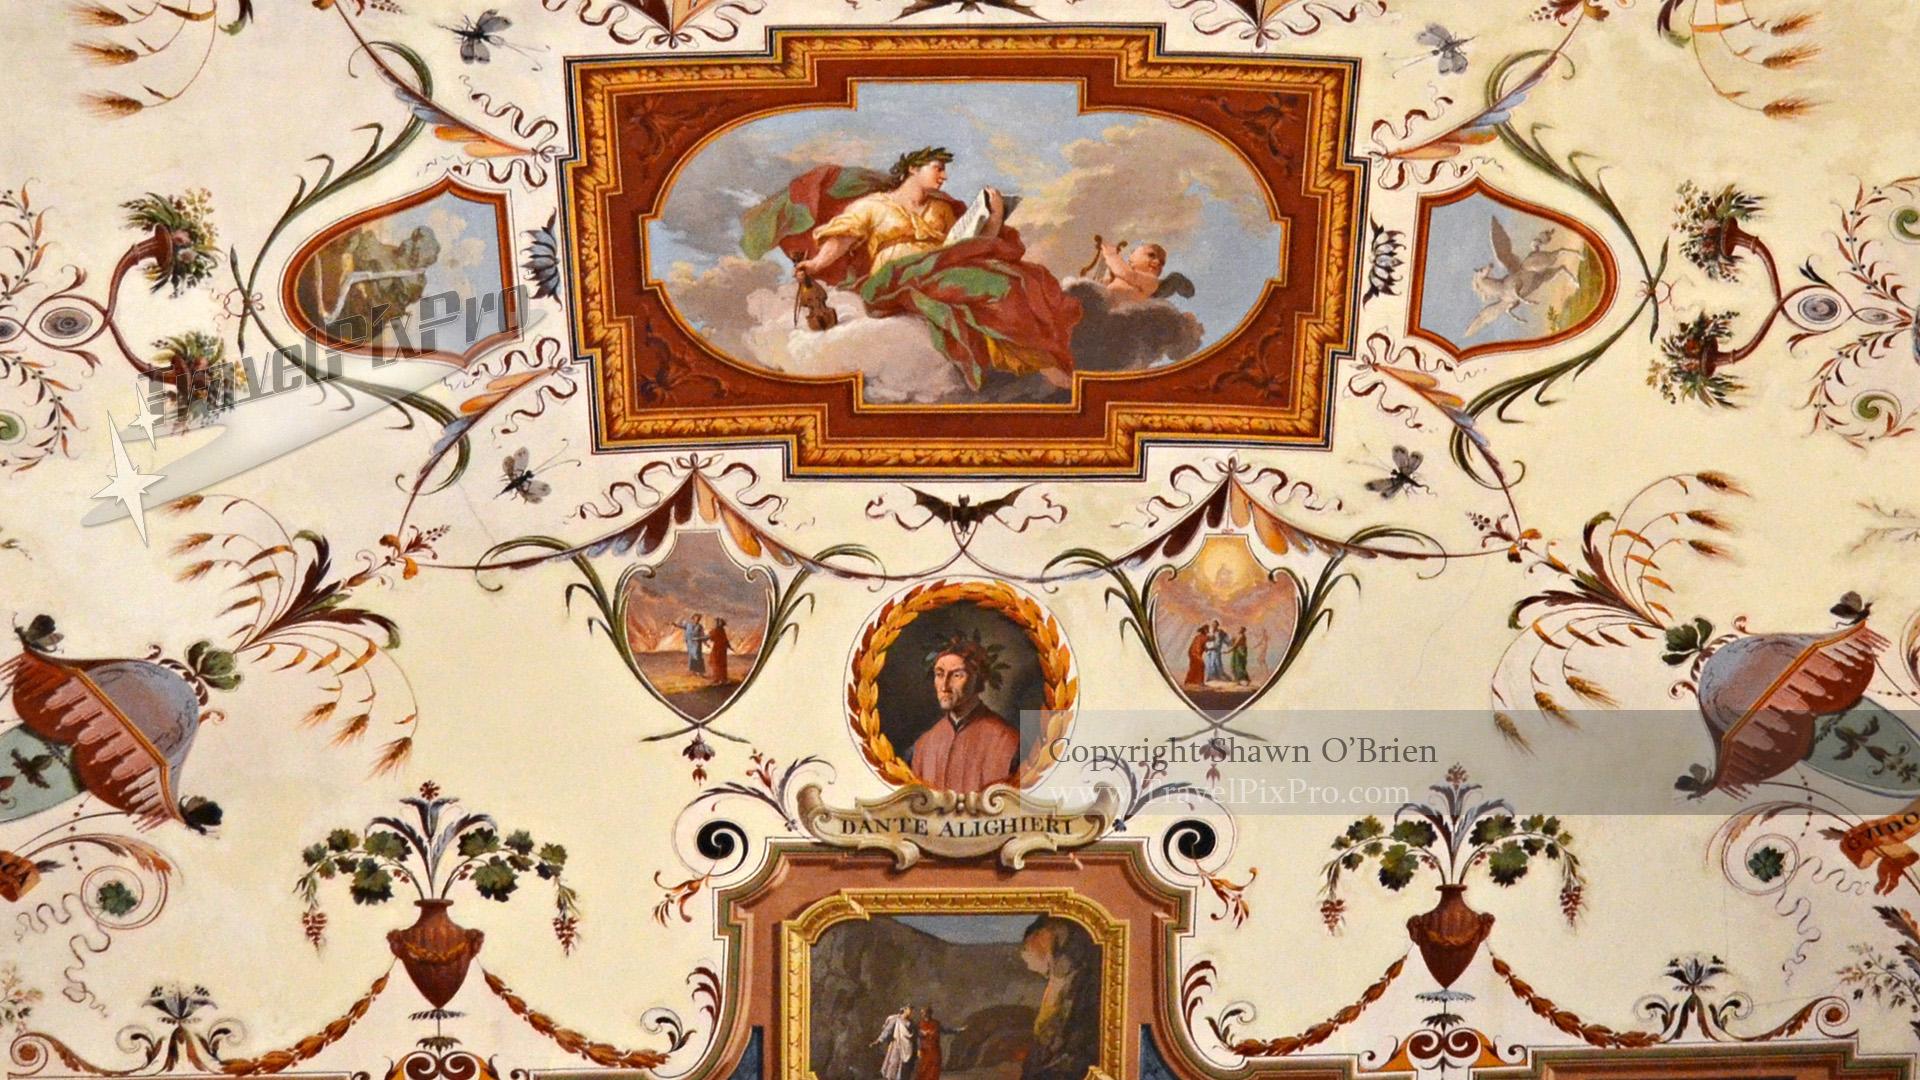 Uffizi Gallery Ceiling Artwork